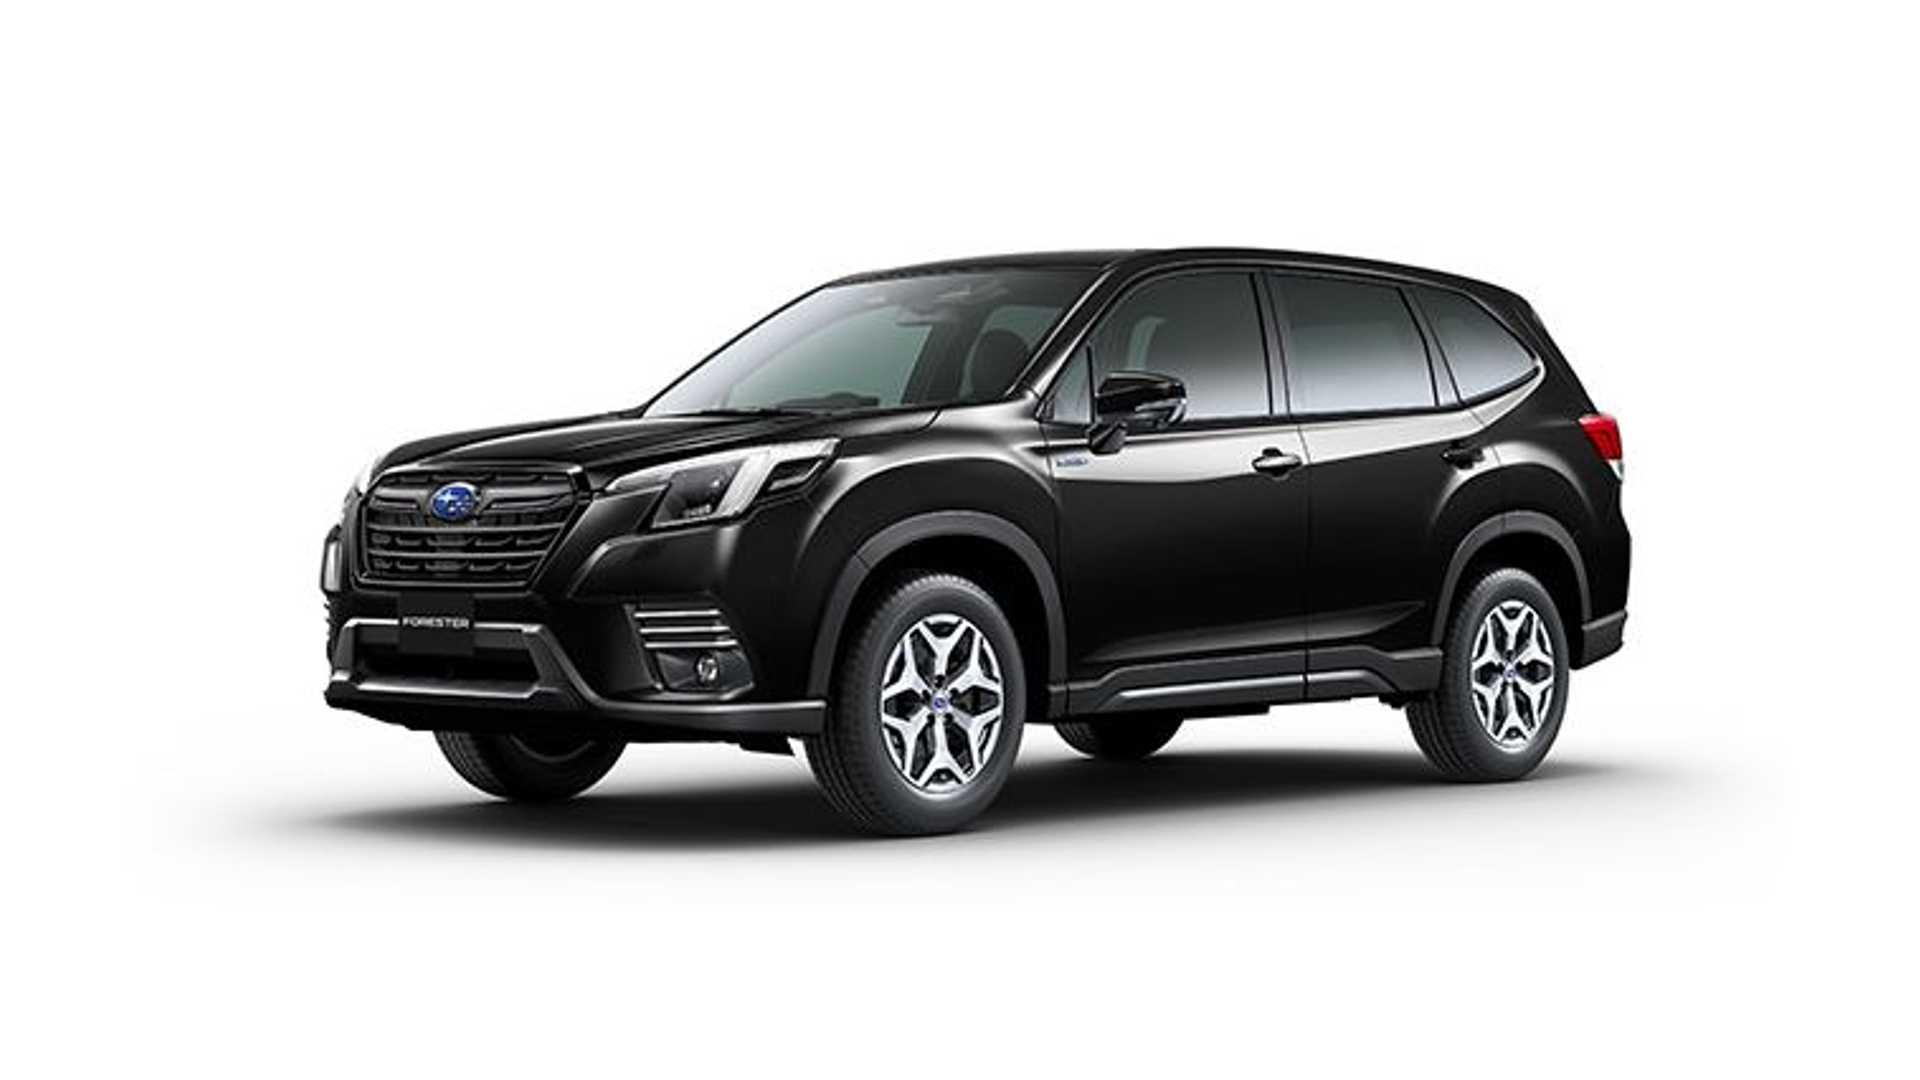 Subaru-Forester-facelift-23